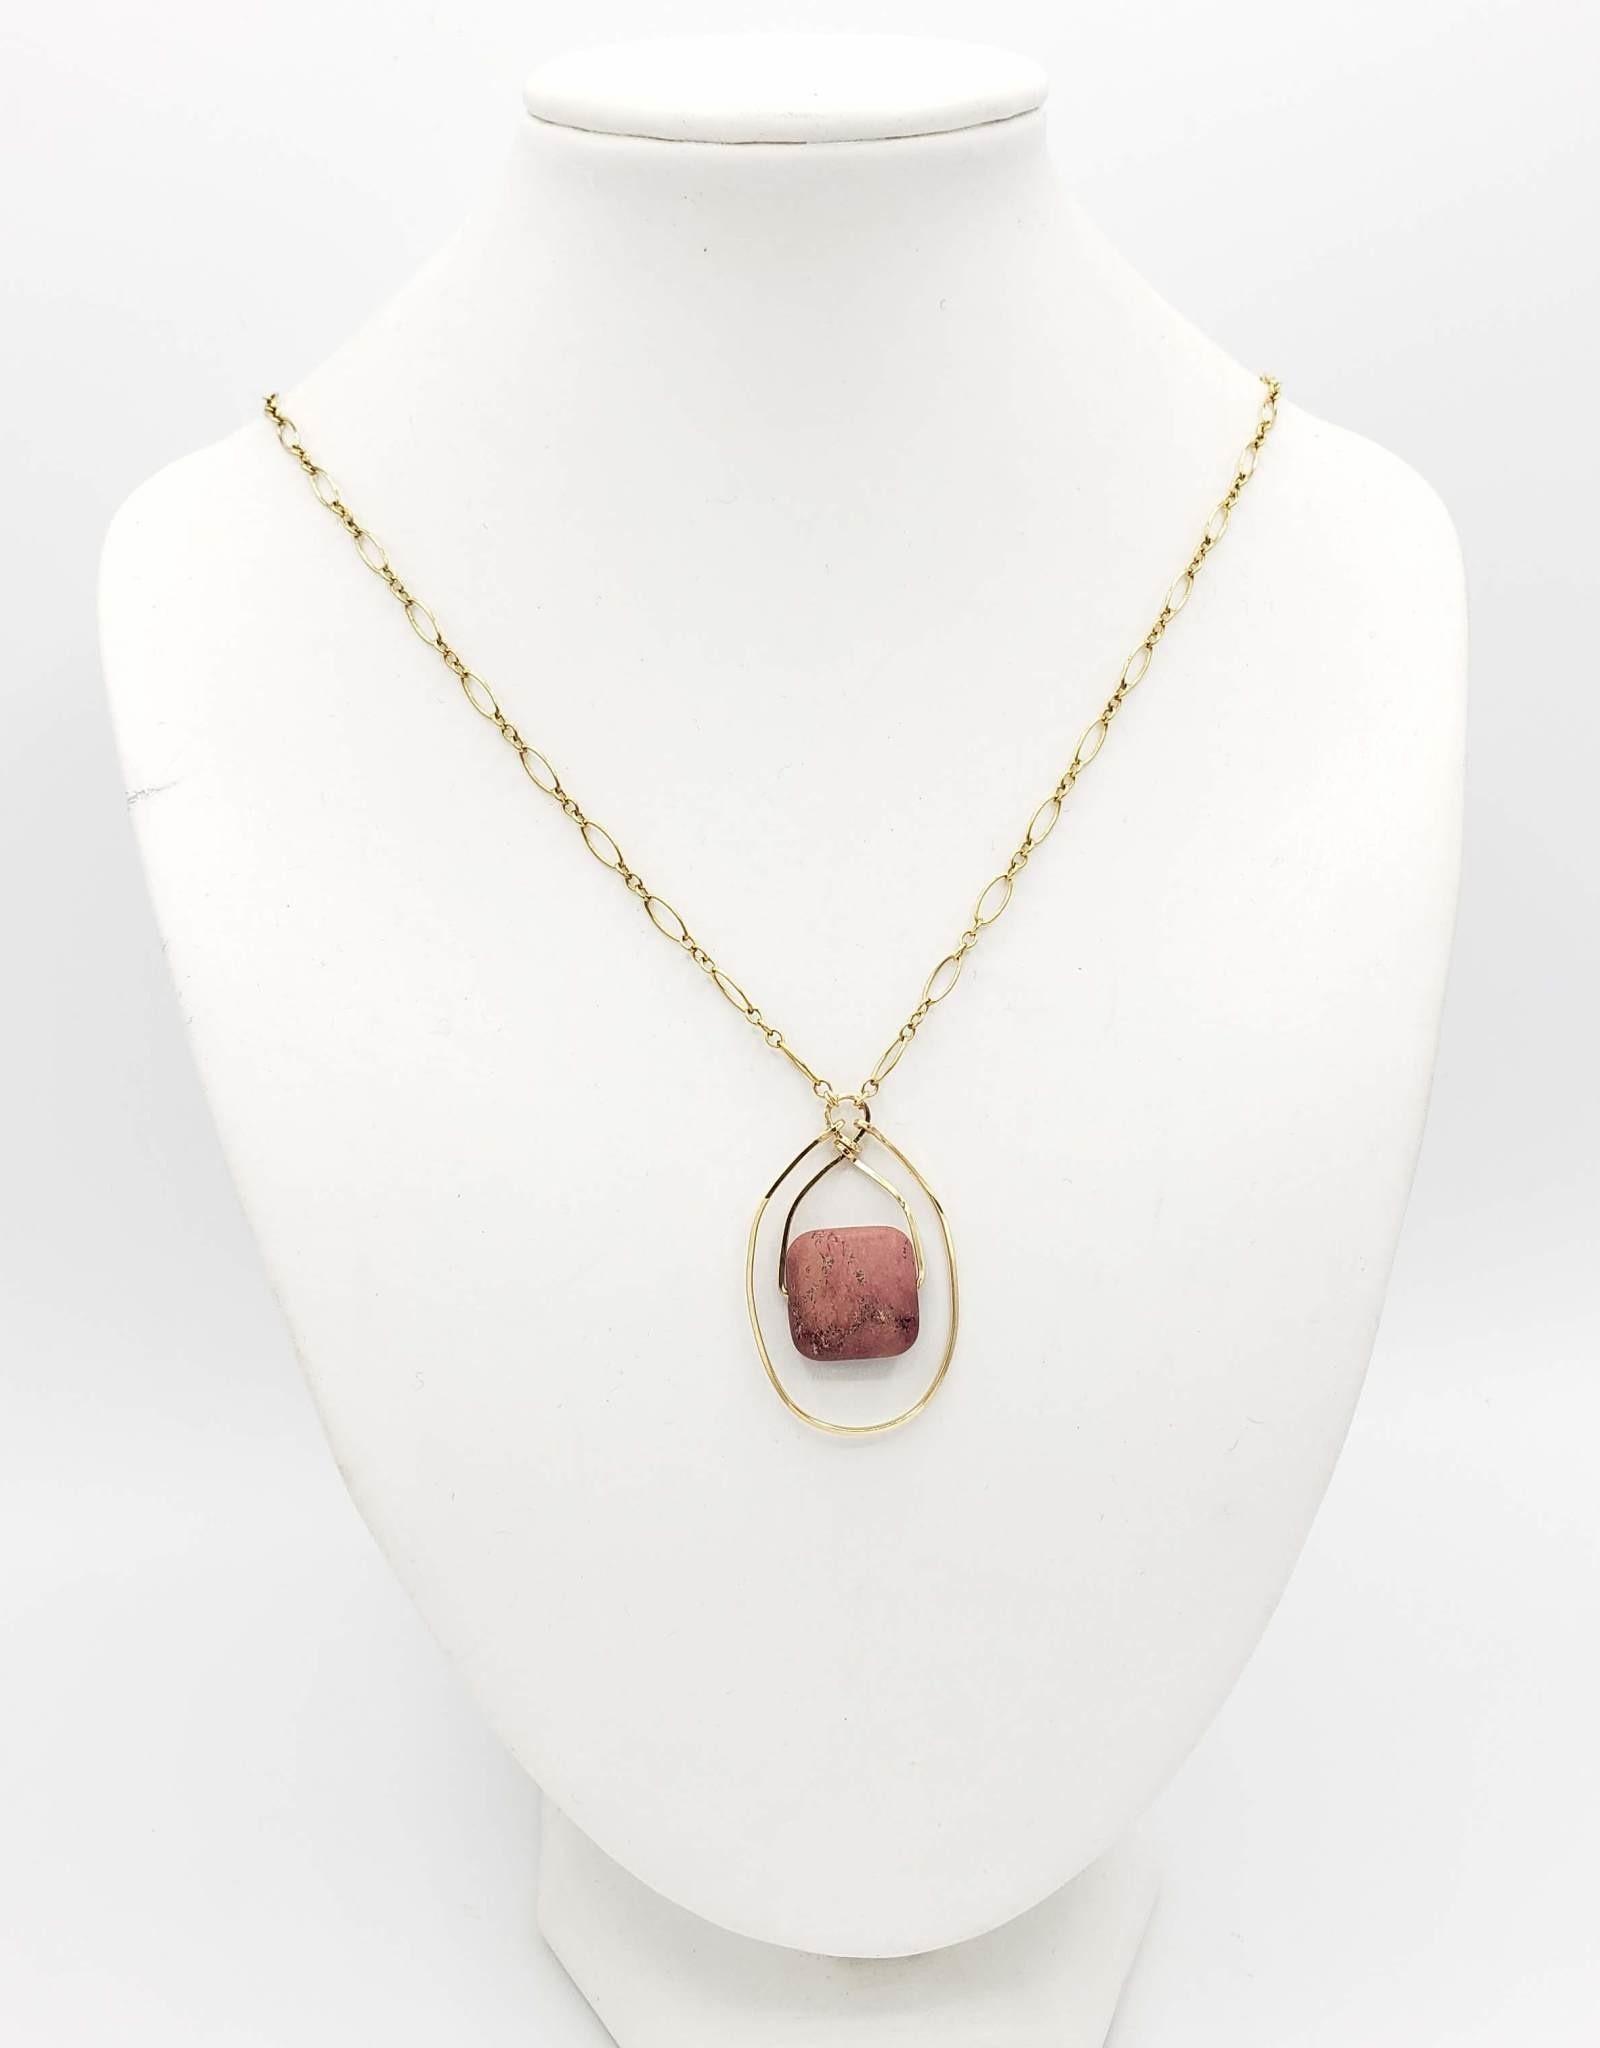 Redux Red Jasper Necklace - Gold fill